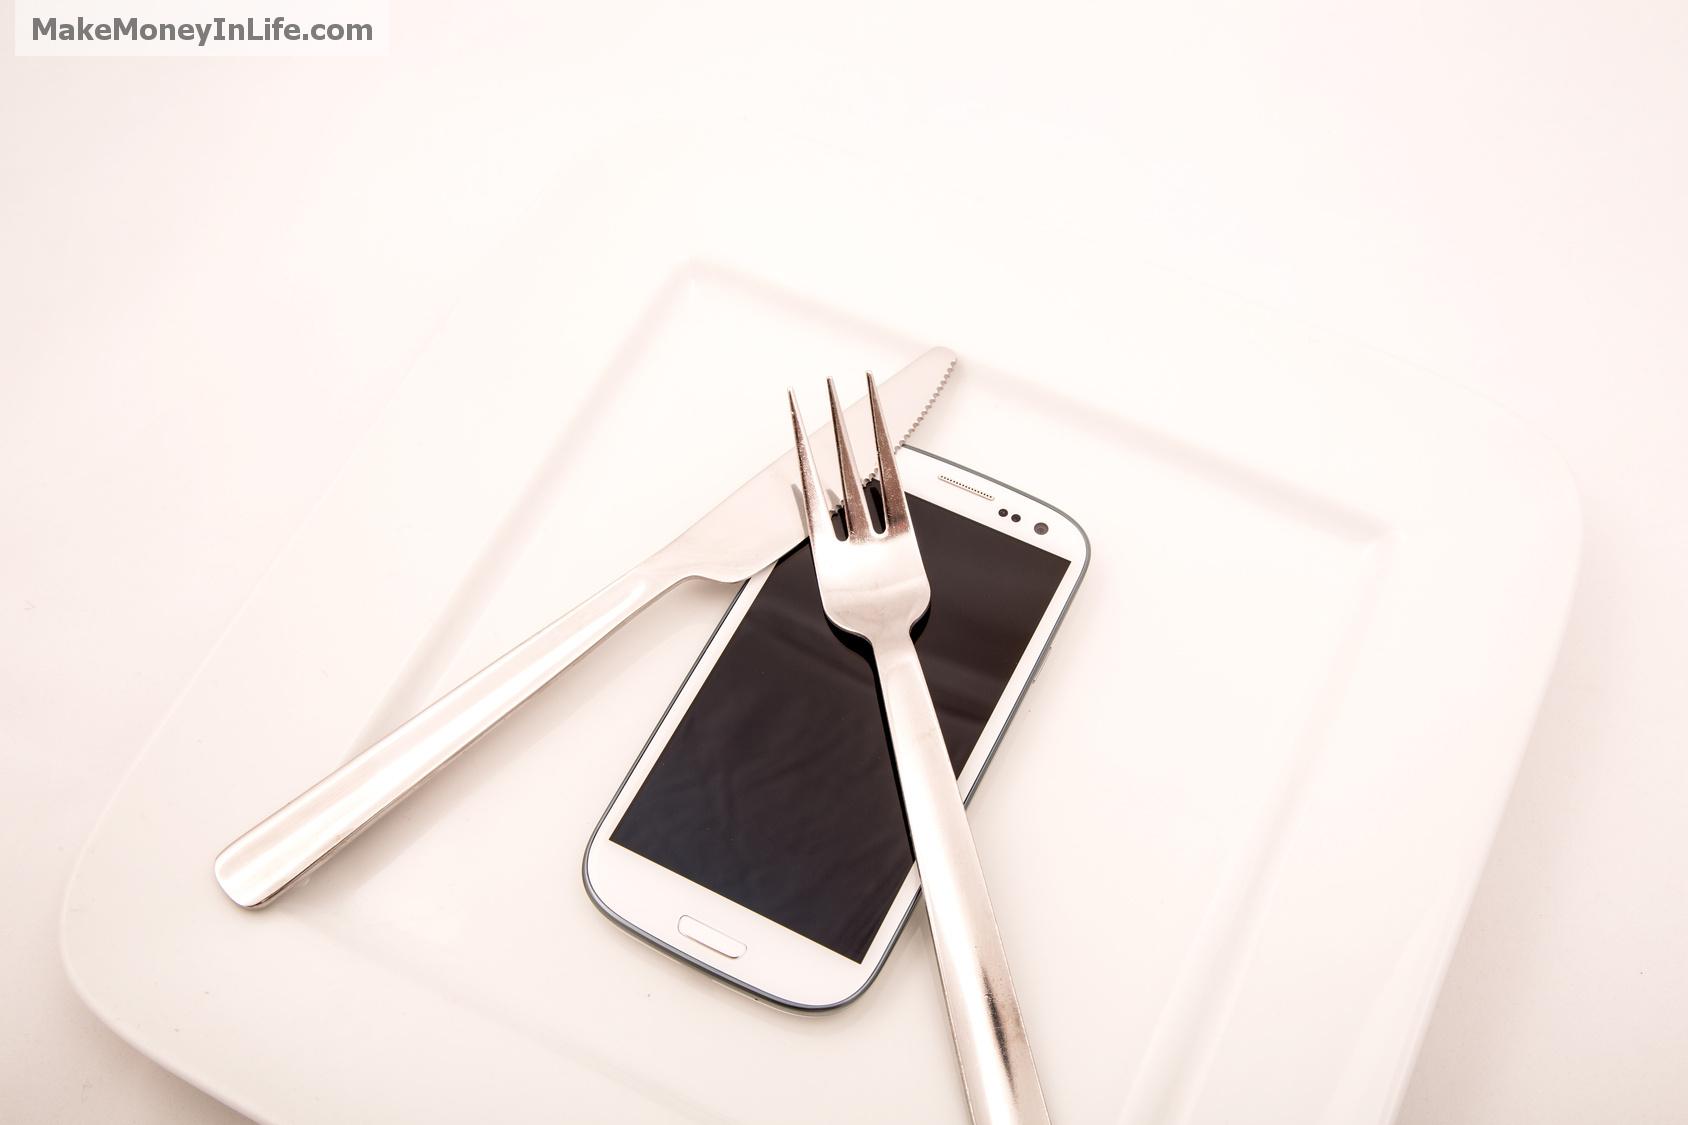 Smartphone Bill